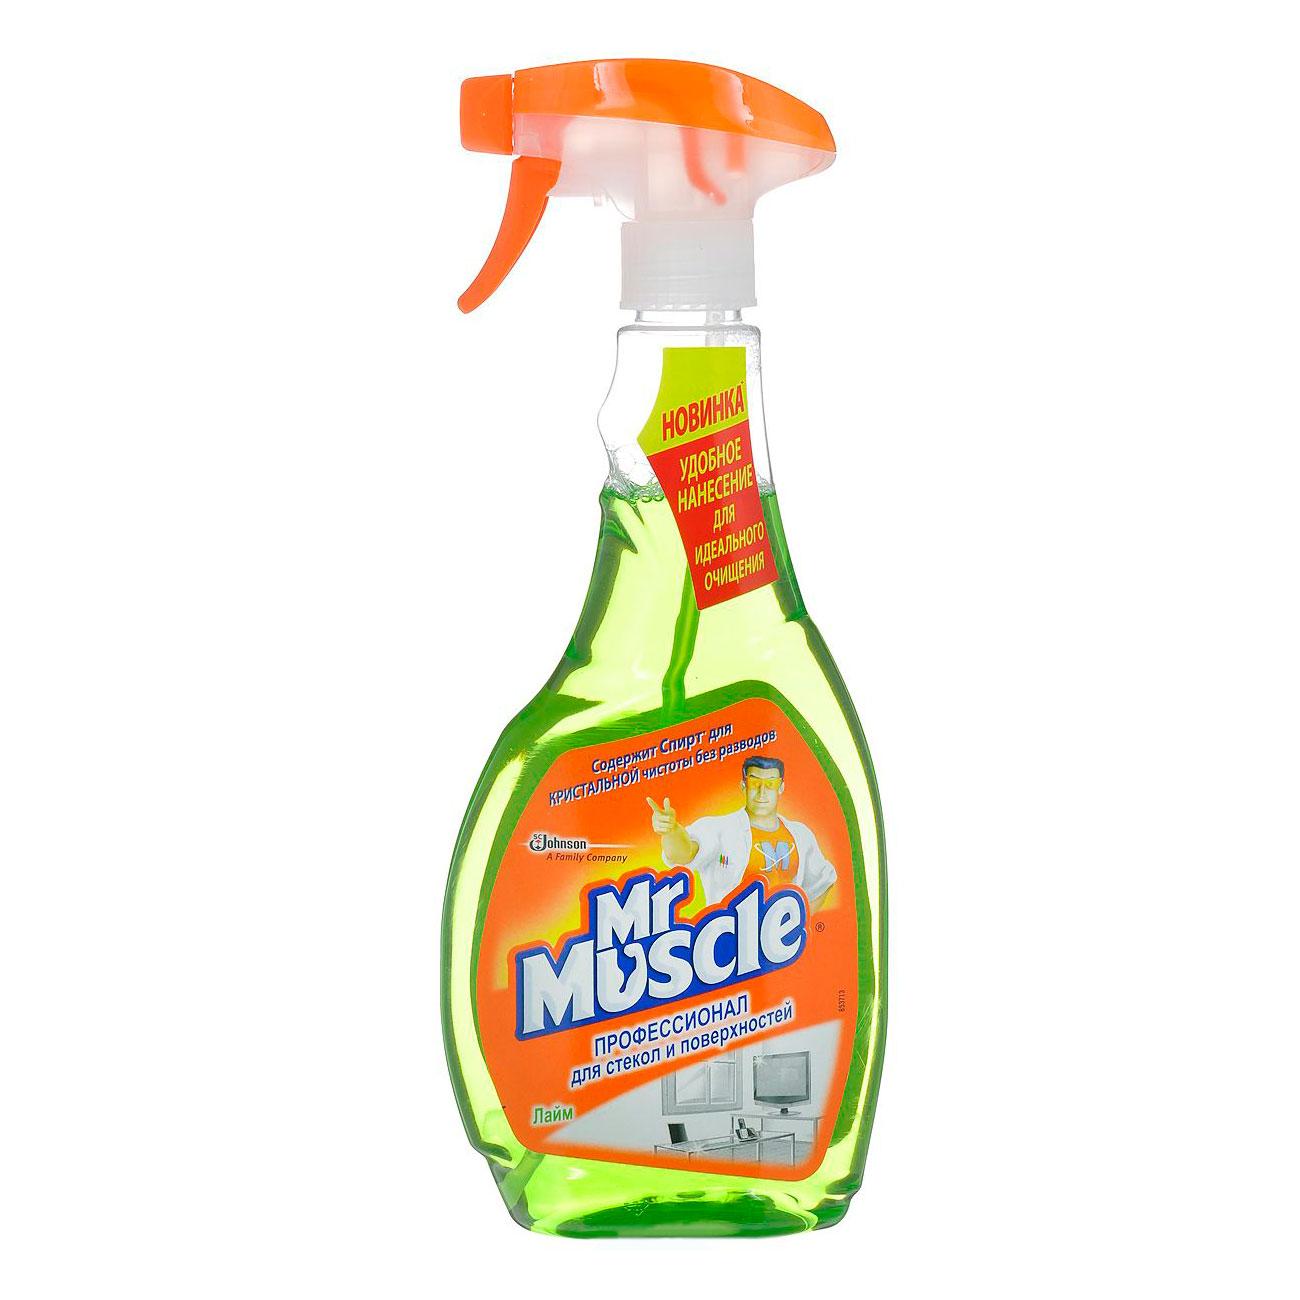 Средство Мистер Мускул триггер 500 мл для стекол и других поверхностей со спиртом Лайм<br>